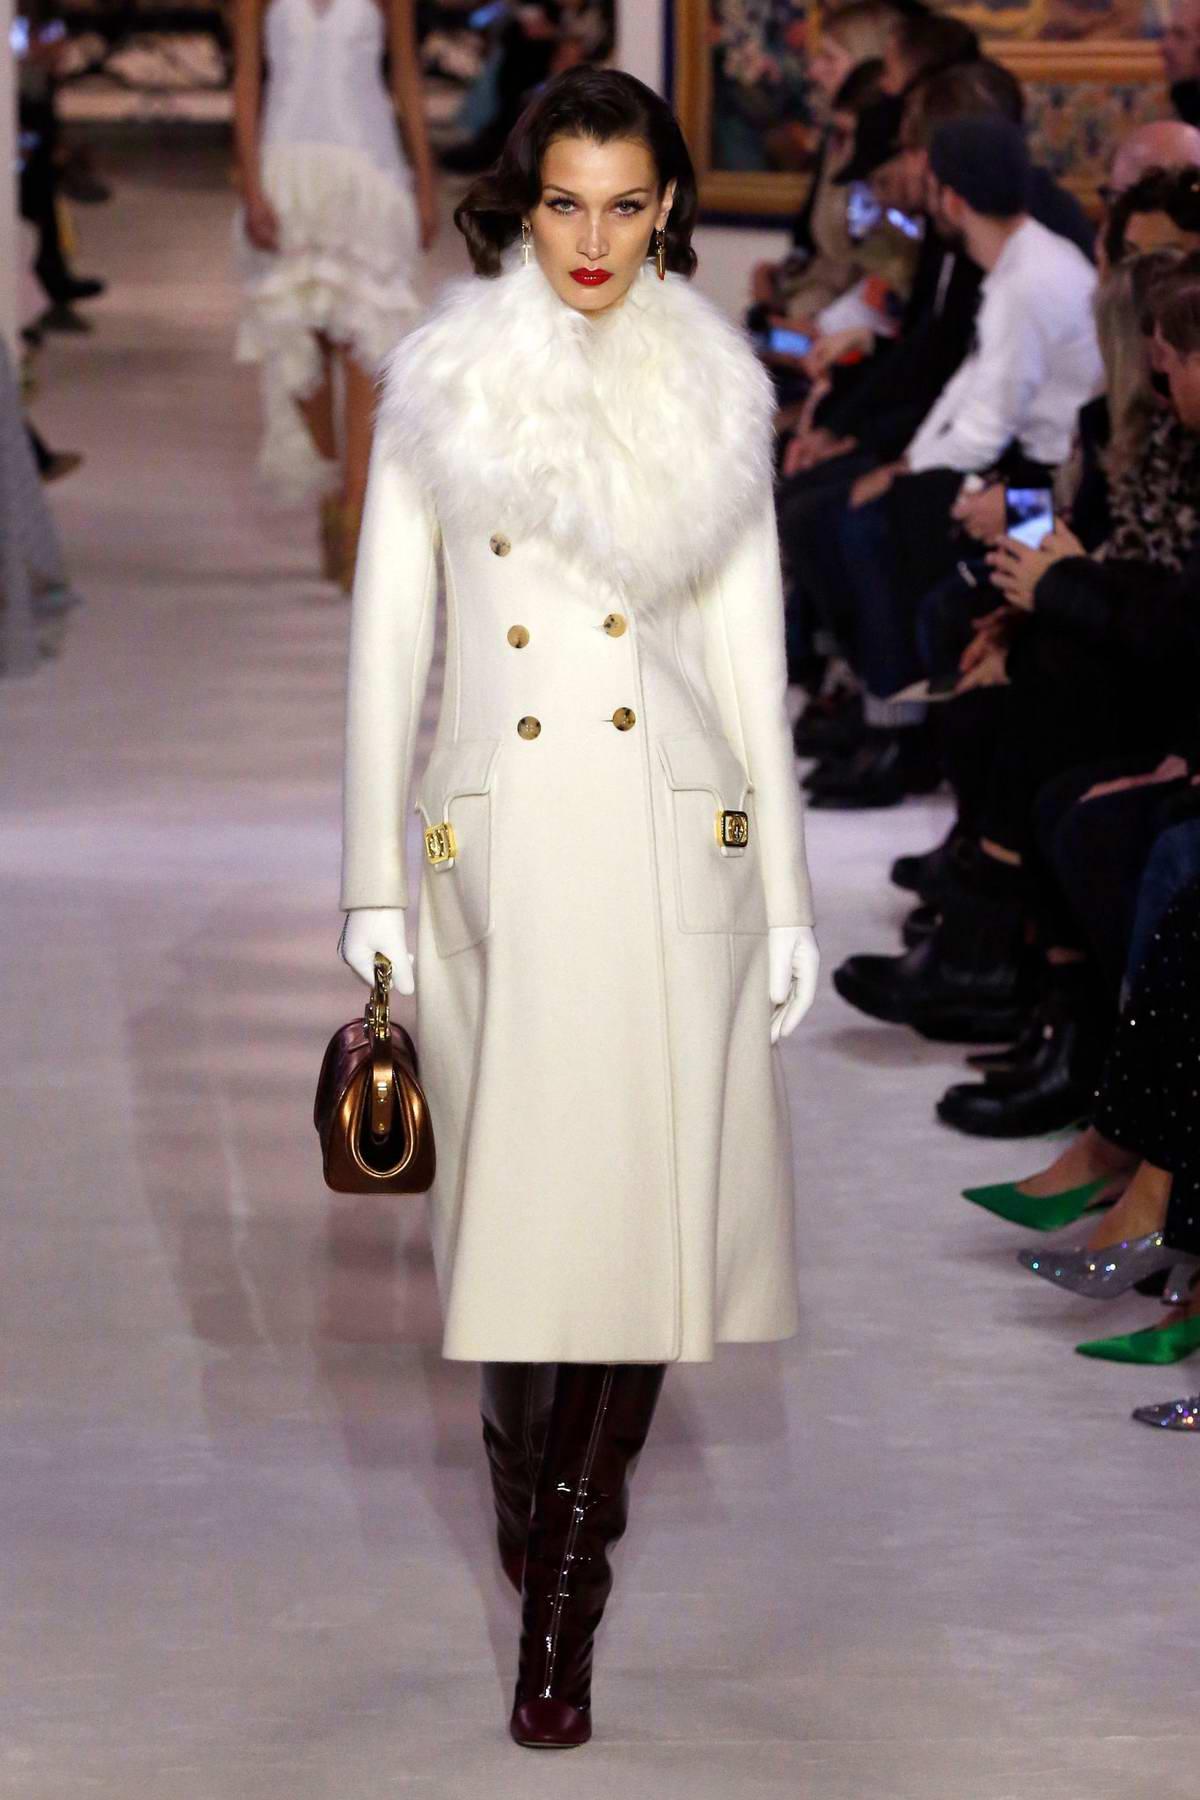 Bella Hadid walks the runway for Lanvin F/W 2020 fashion show during Paris Fashion Week in Paris, France